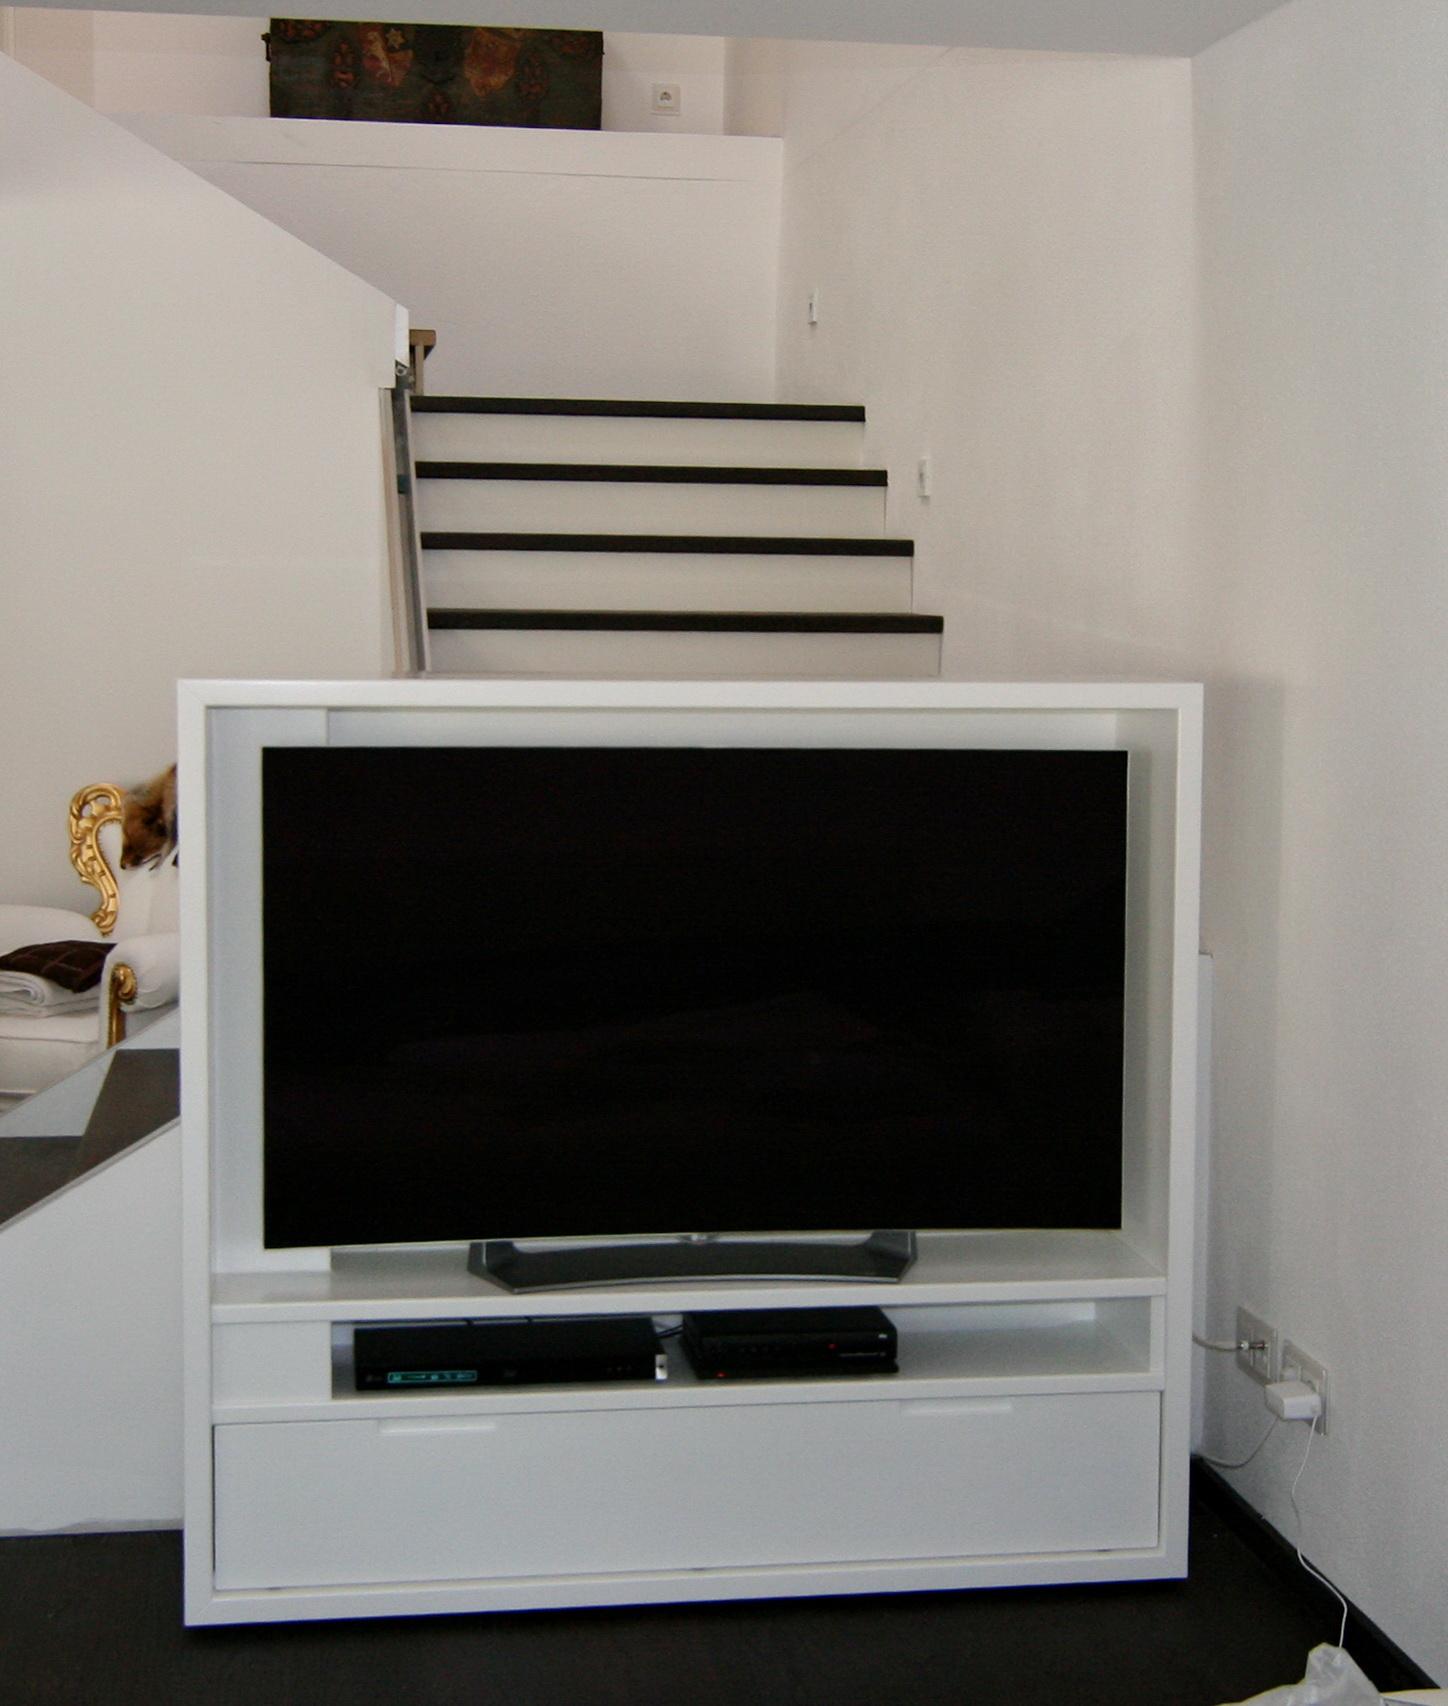 Fahrbares TV-Möbel in weiß